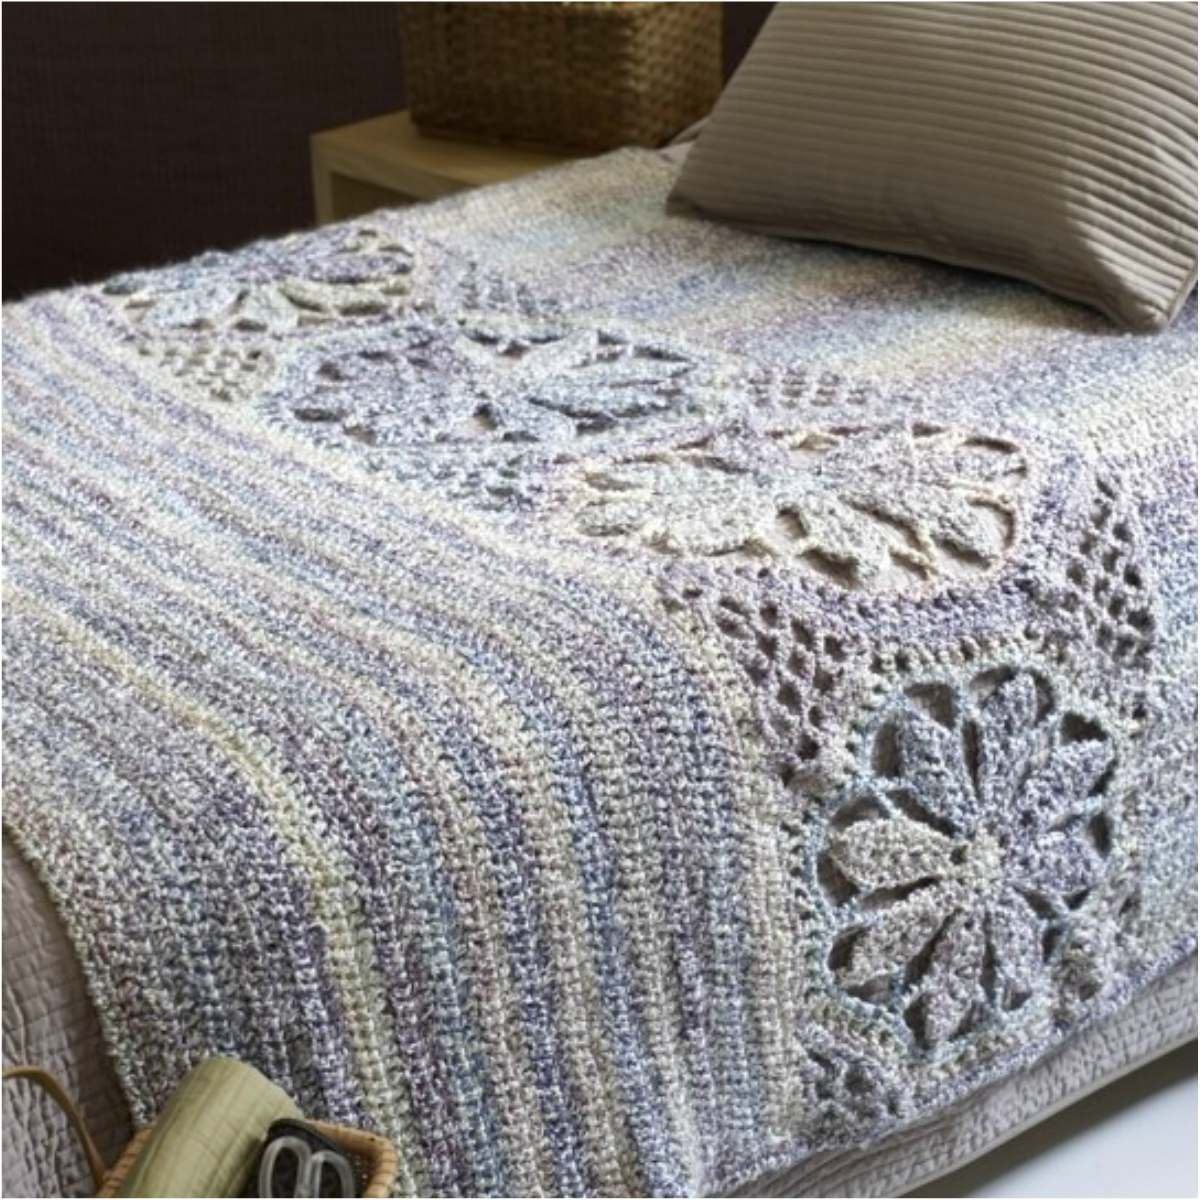 magnolia-afghan-free-crochet-pattern-fb | crochet | Pinterest ...